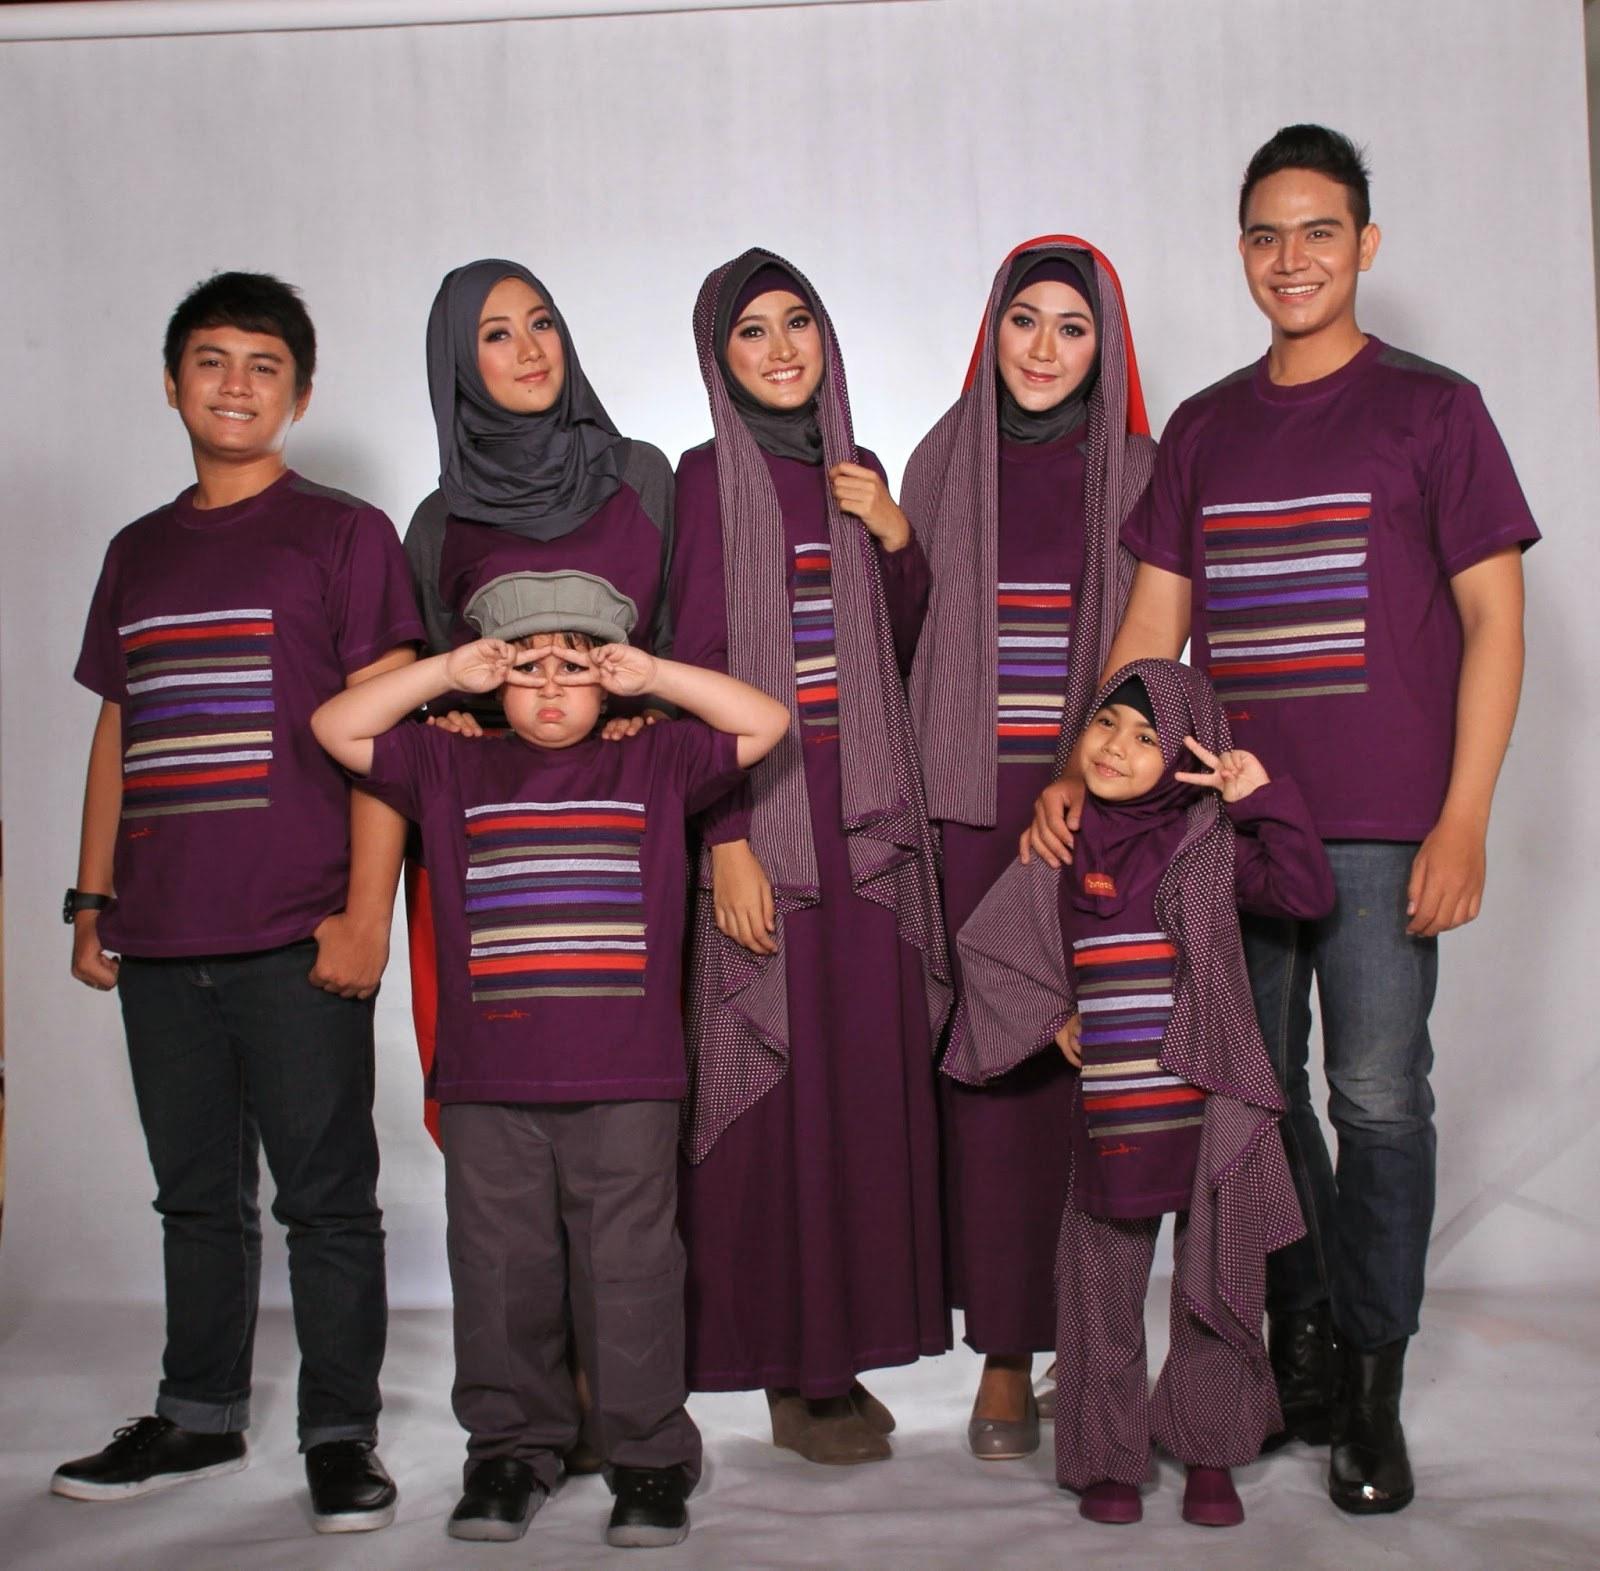 Inspirasi Baju Lebaran Pria 2017 9ddf Model Baju Keluarga Untuk Hari Raya Lebaran 2018